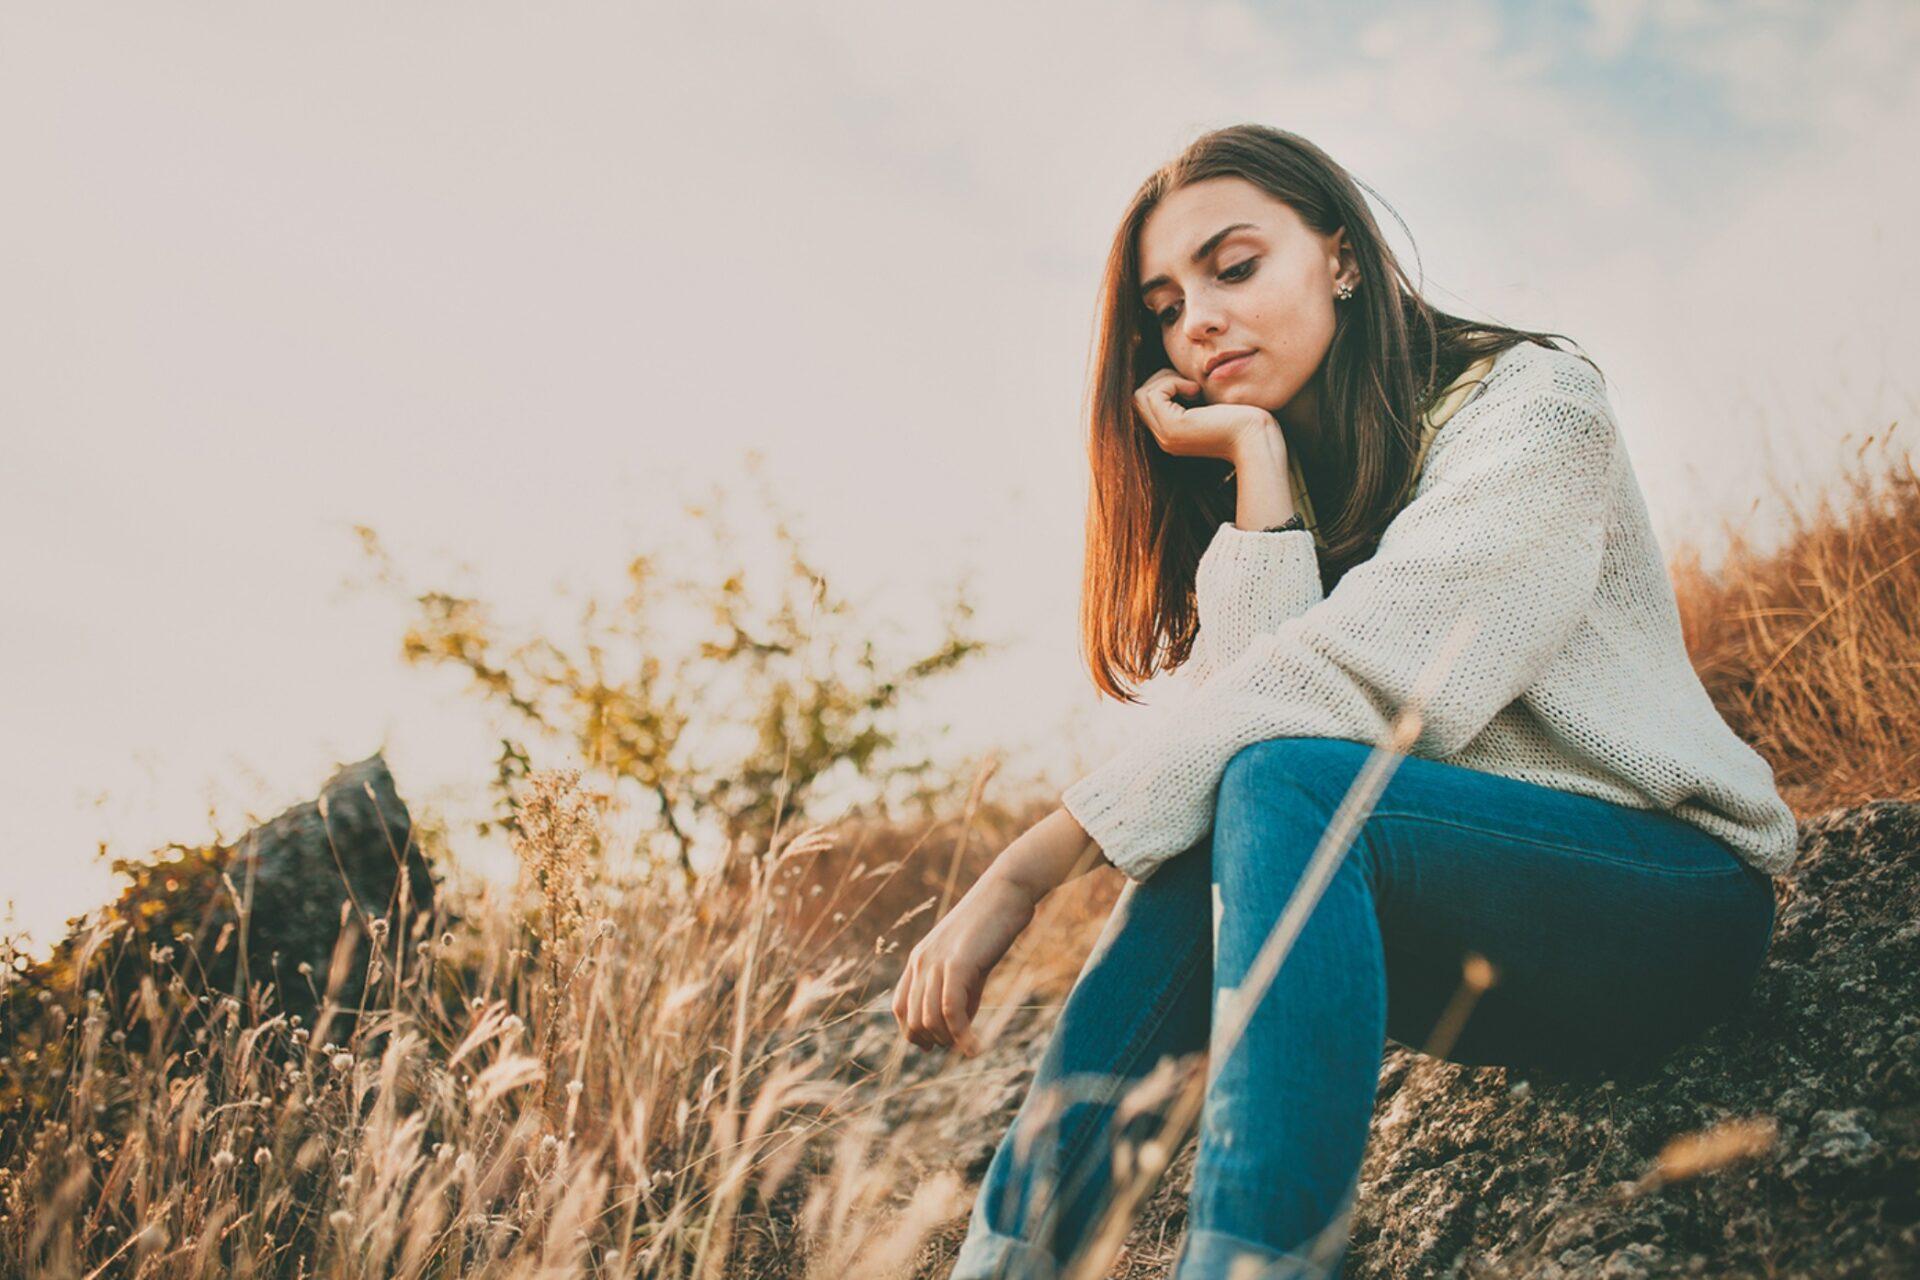 Faalangst: 5 tips die je helpen bij angst om te falen